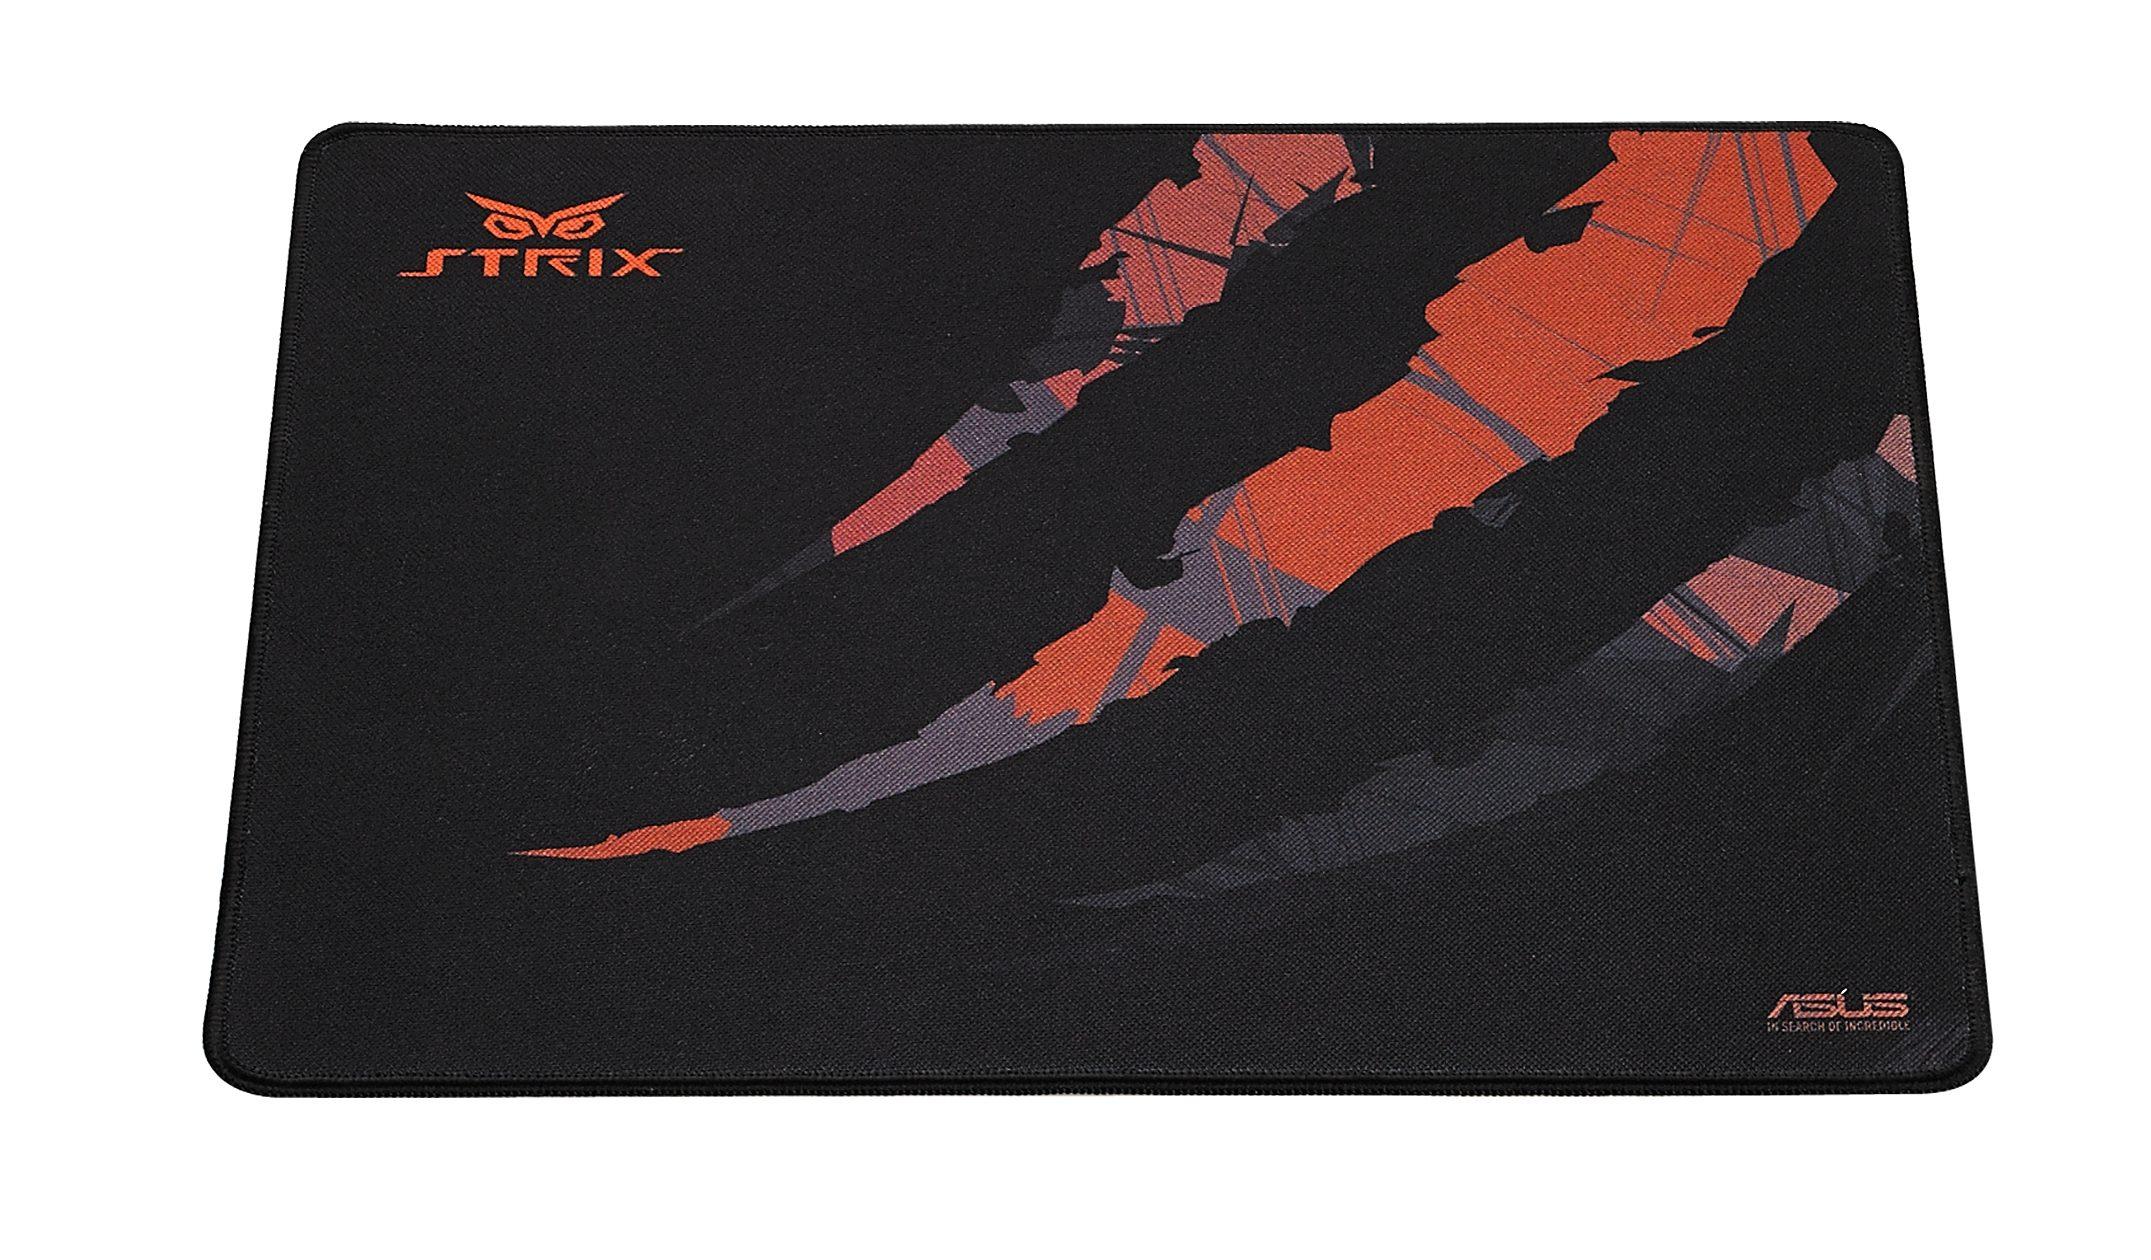 ASUS Gaming Mauspad Strix Glide Control »Strix Glide Control«